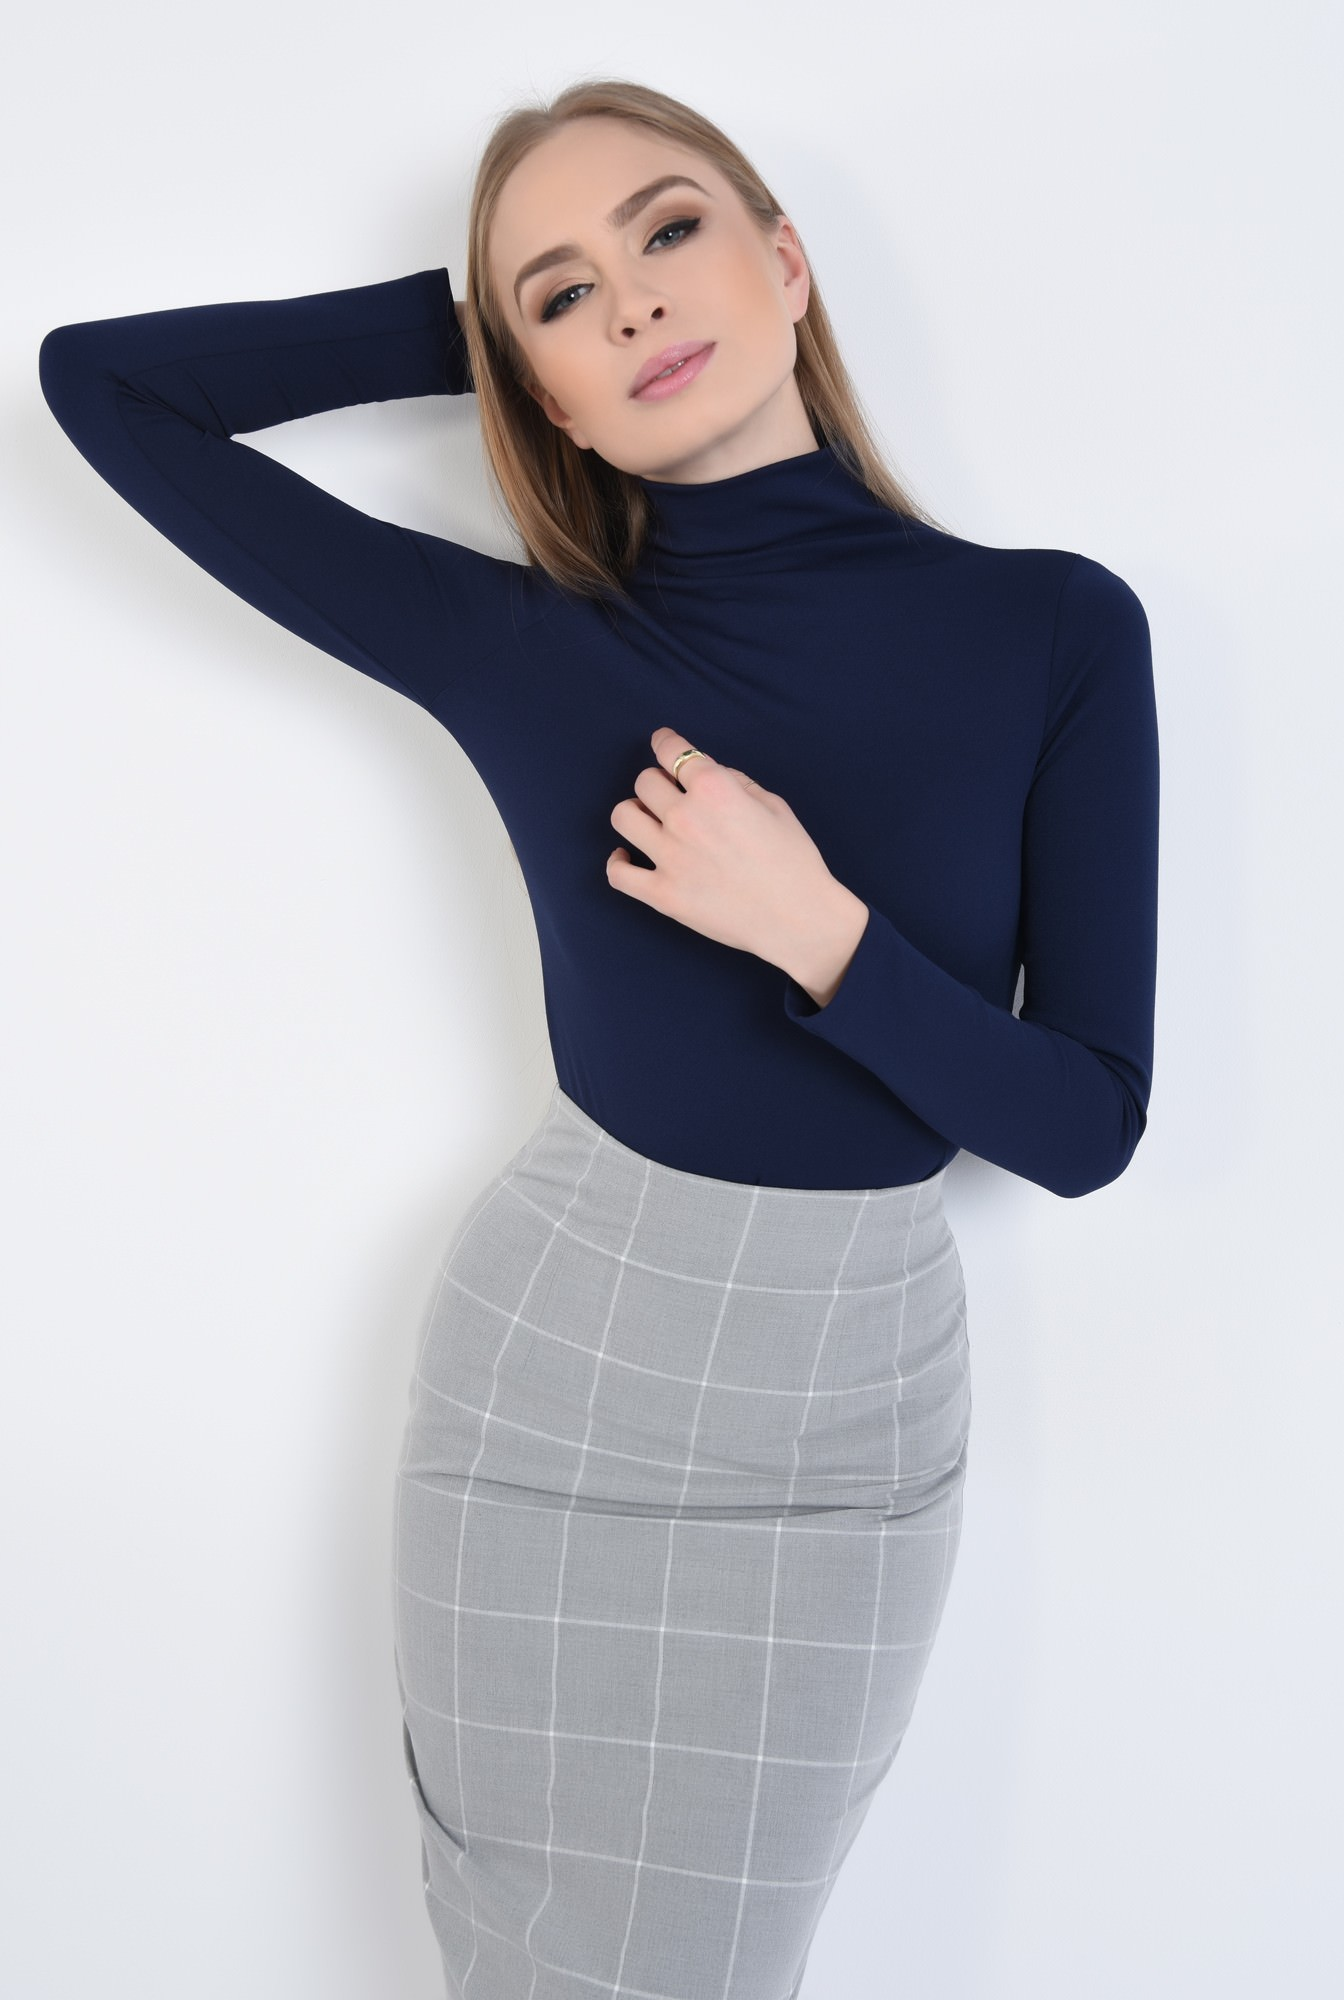 0 - 360 - Bluza casual stretch, elastan, helanca